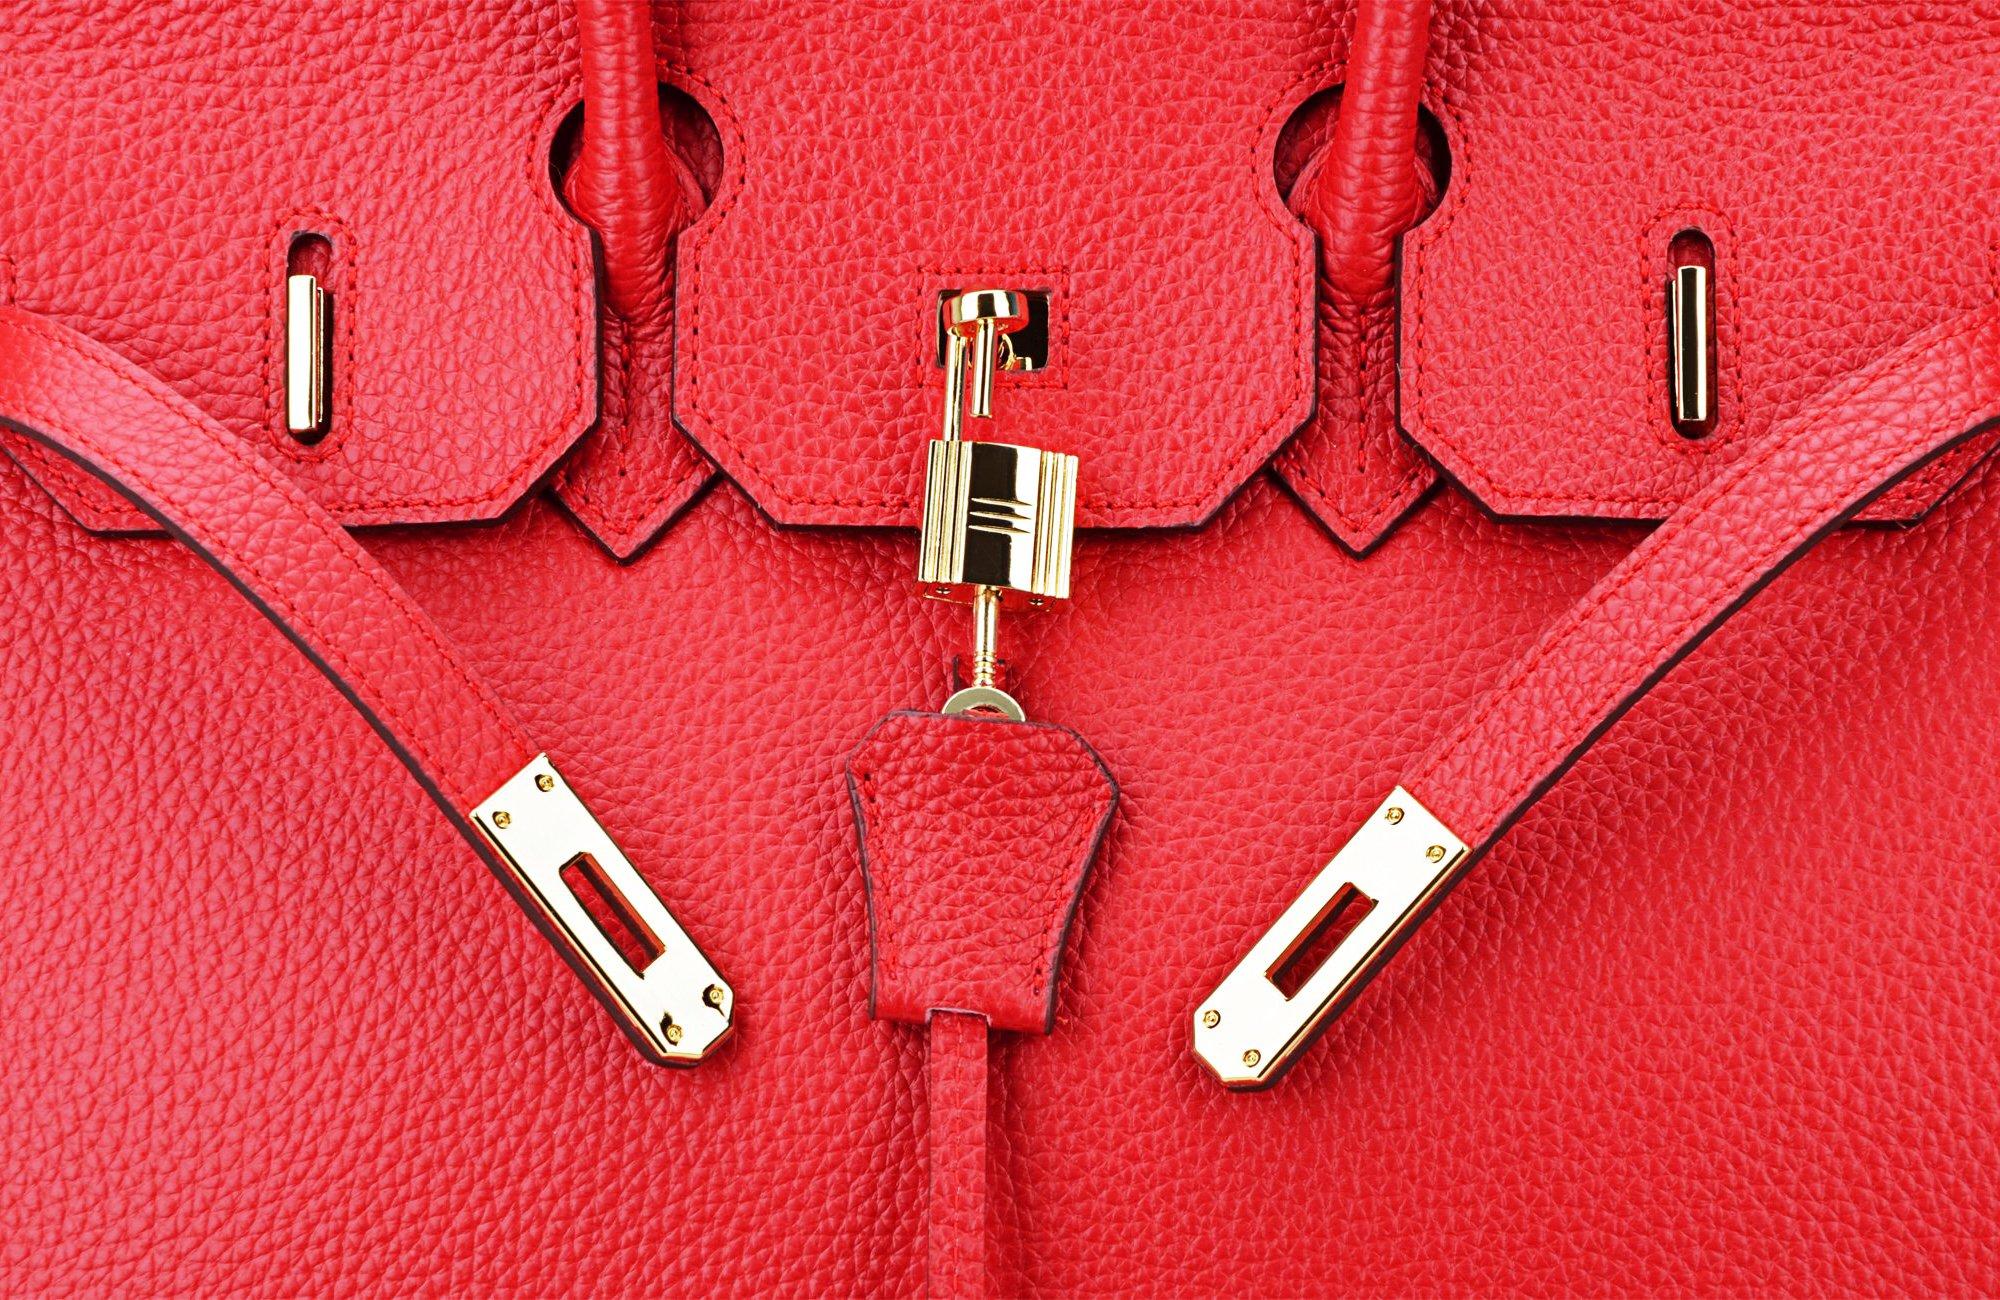 SanMario Designer Handbag Top Handle Padlock Women's Leather Bag with Golden Hardware Red 35cm/14'' by SanMario (Image #7)